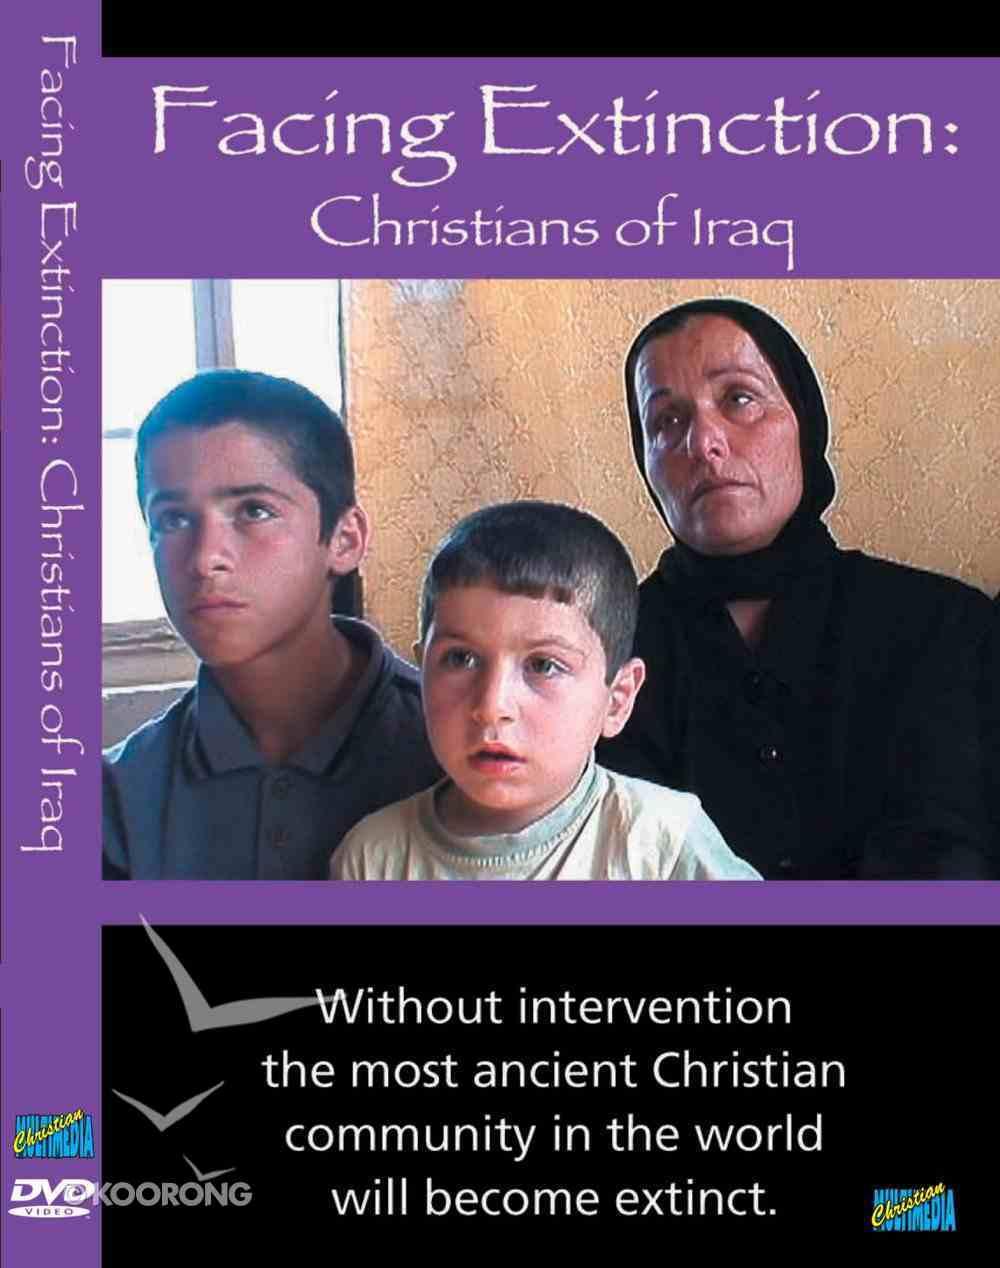 Facing Extinction: Christians in Iraq DVD